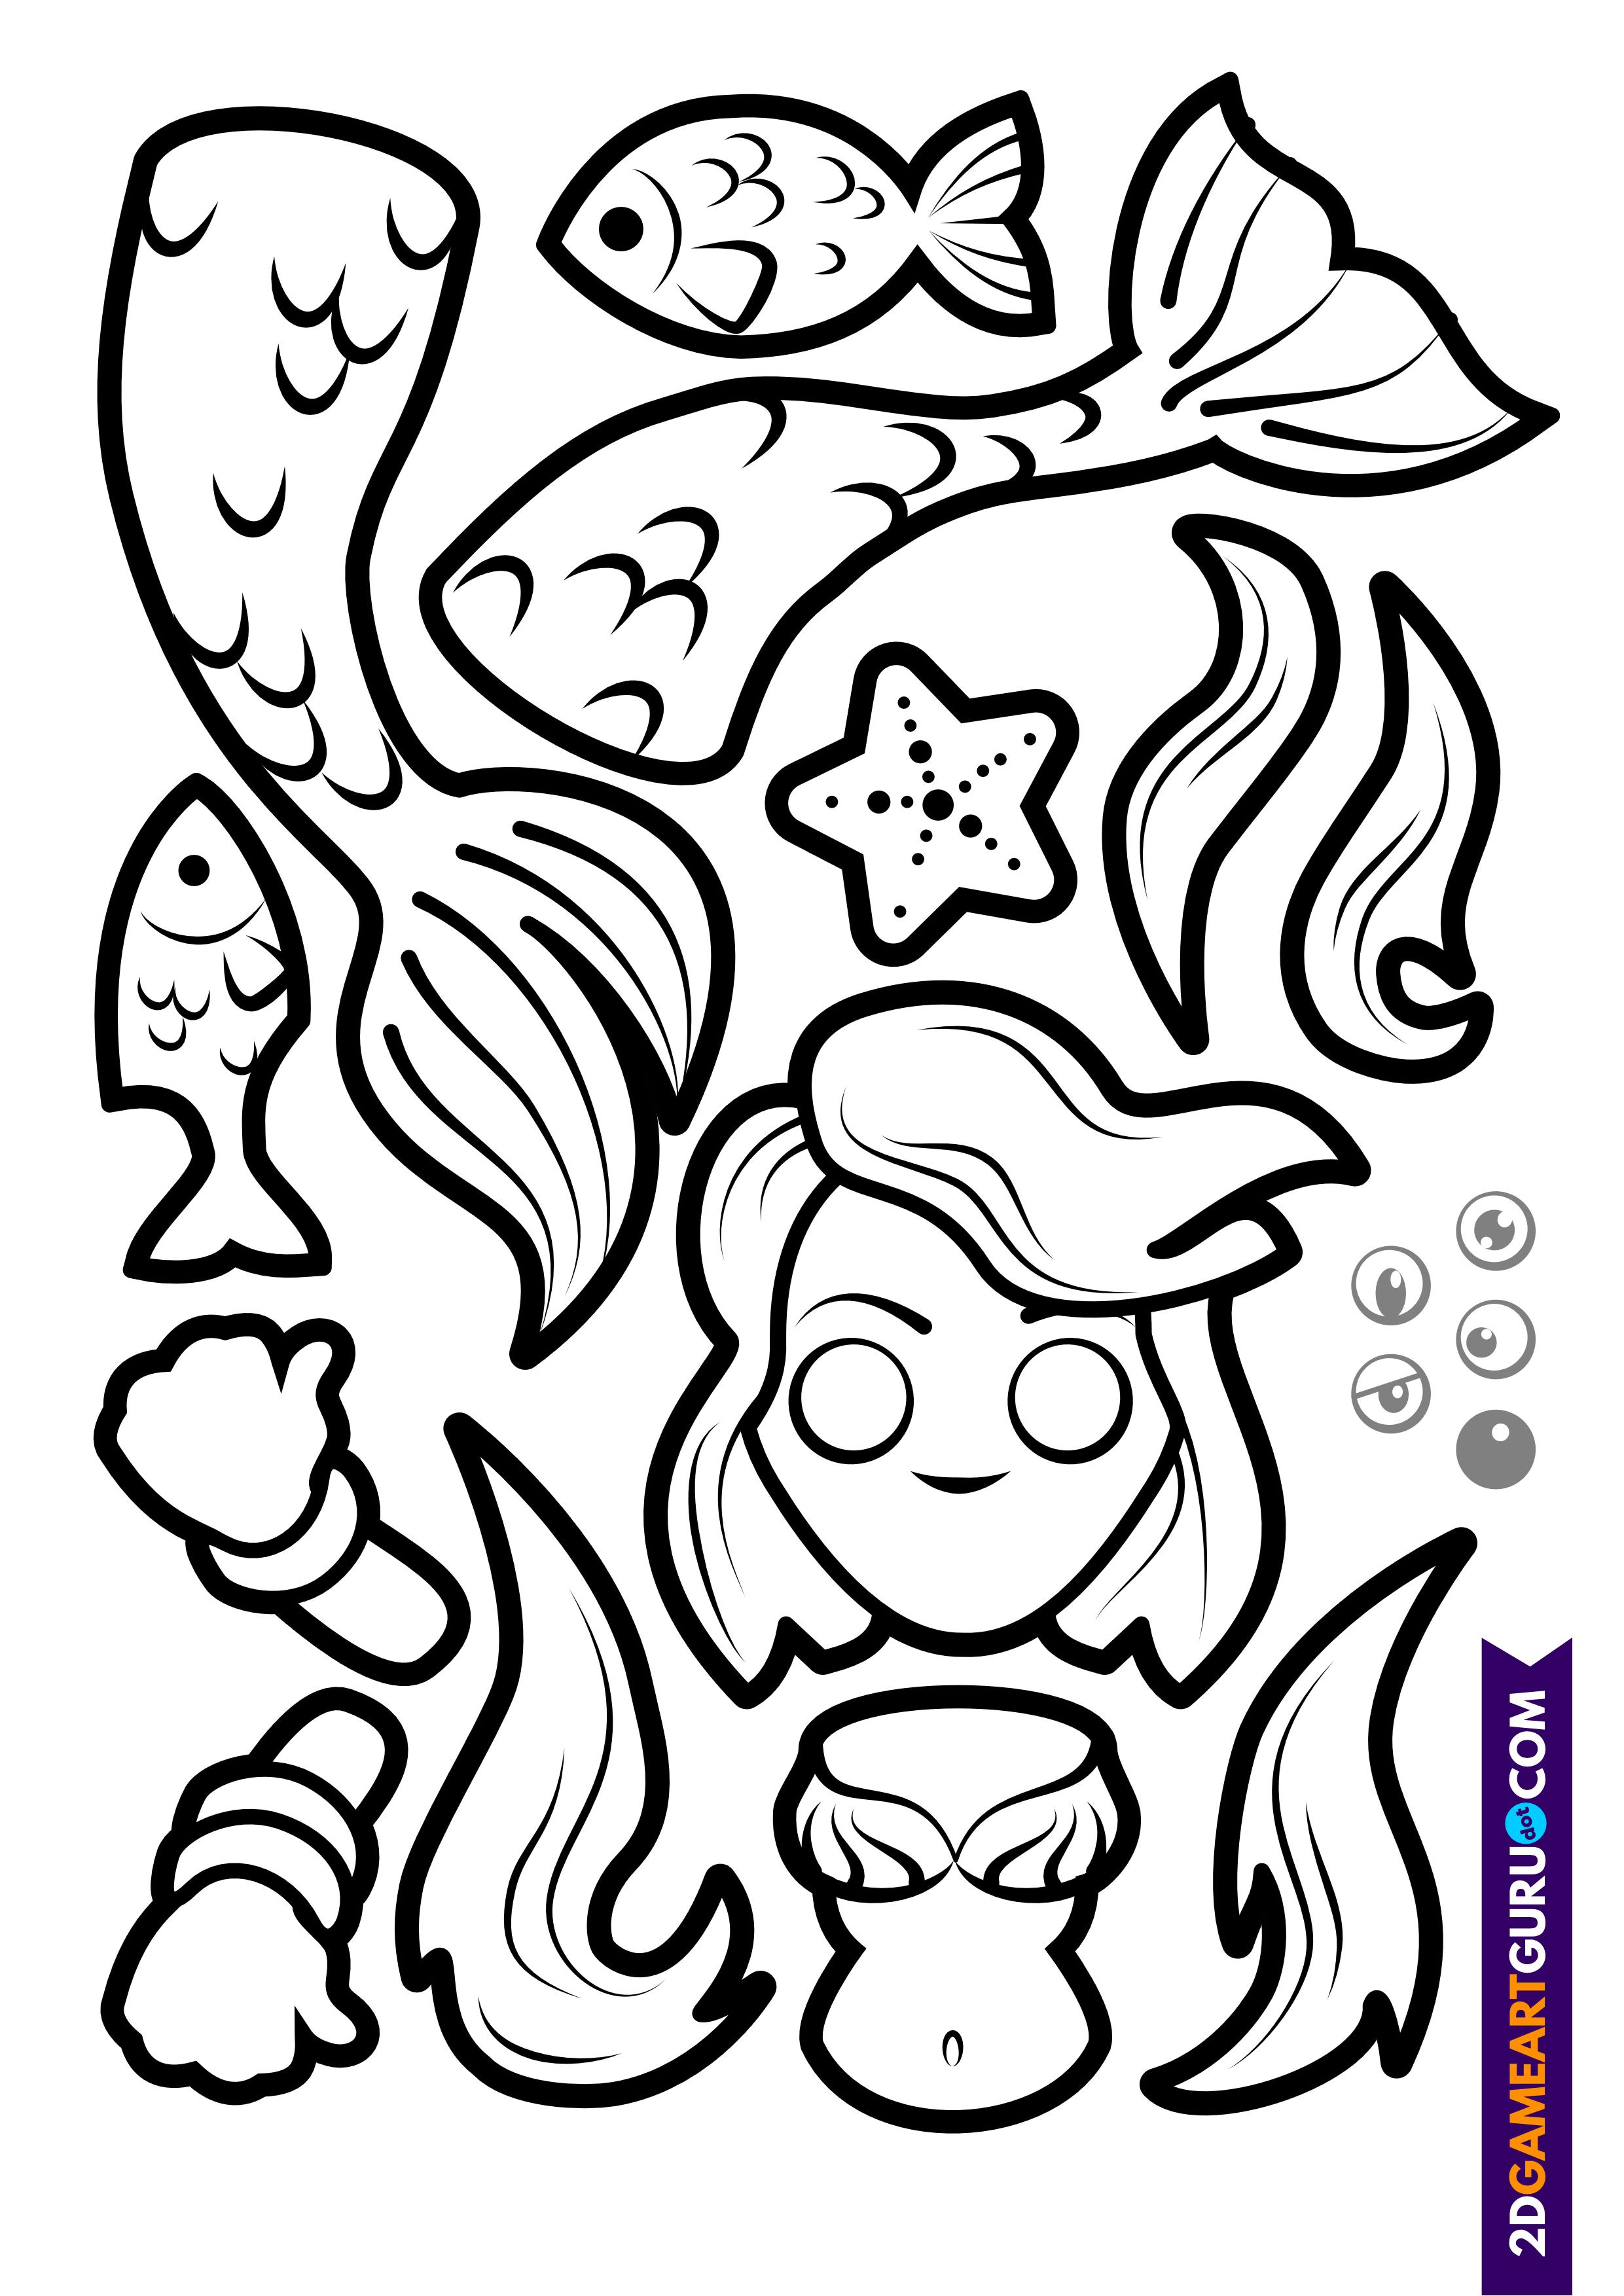 2dgameartguru - craft sheet mermaid